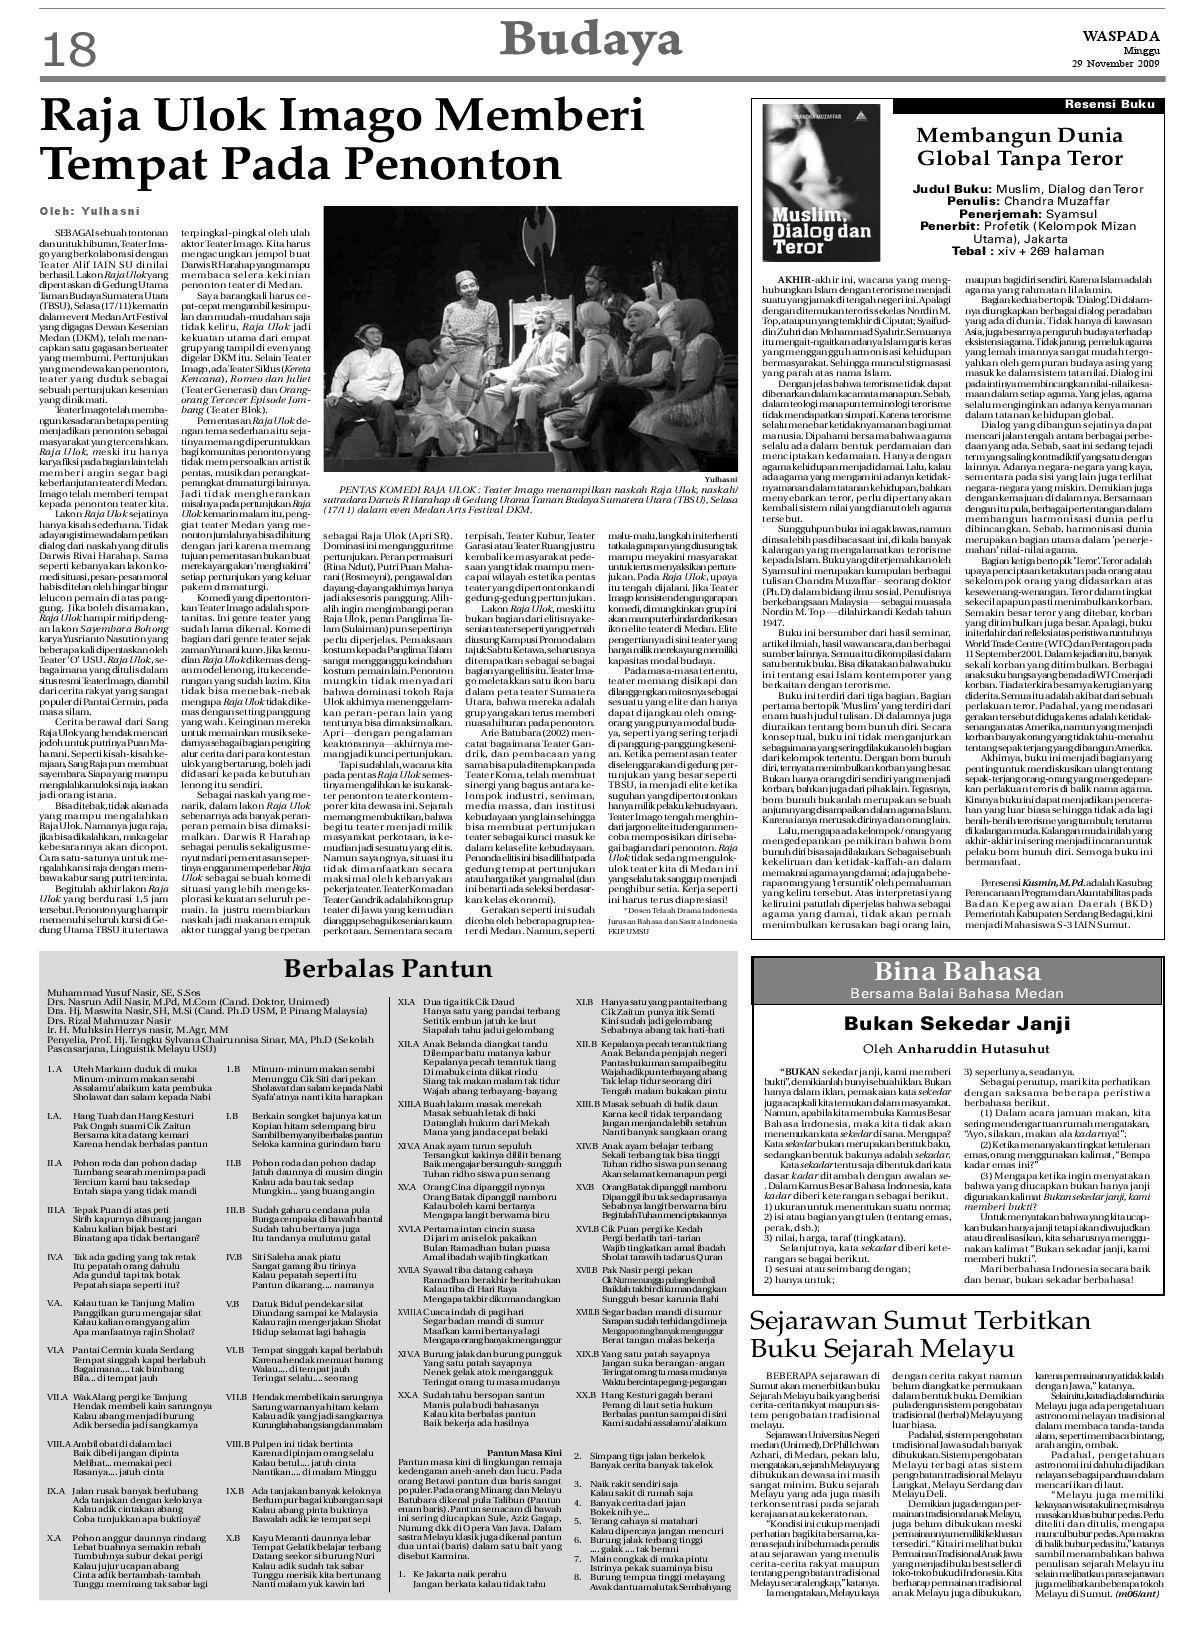 Waspada Minggu 29 November 2009 By Harian Waspada Issuu